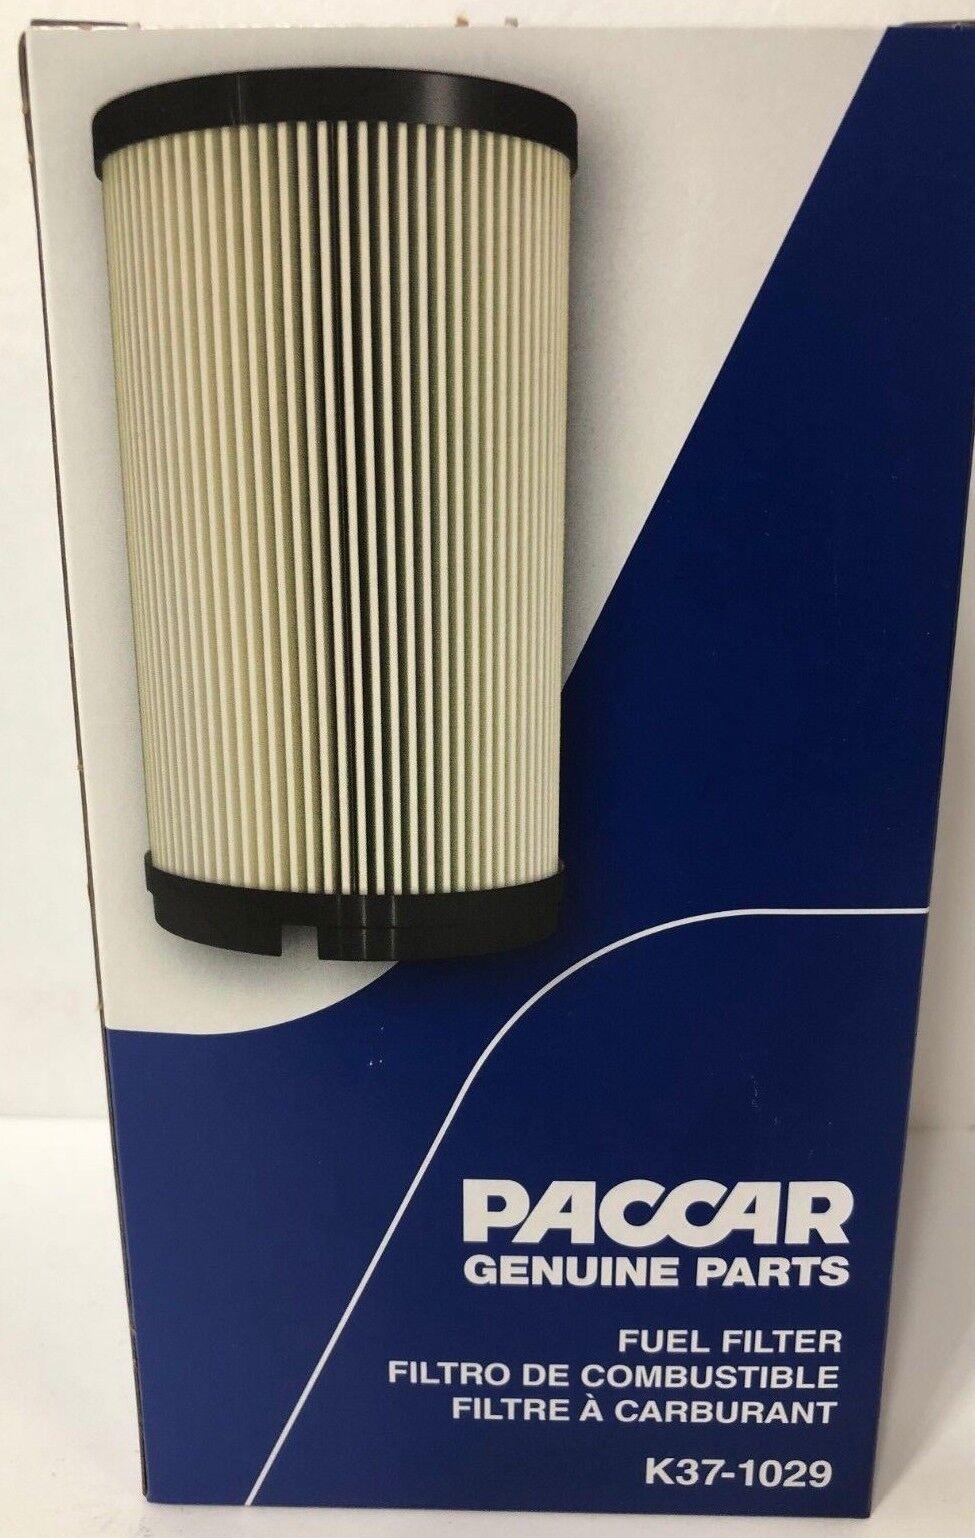 Paccar K37 1029 Fuel Filter Peterbilt Kenworth Ebay Freightliner Wrench Norton Secured Powered By Verisign